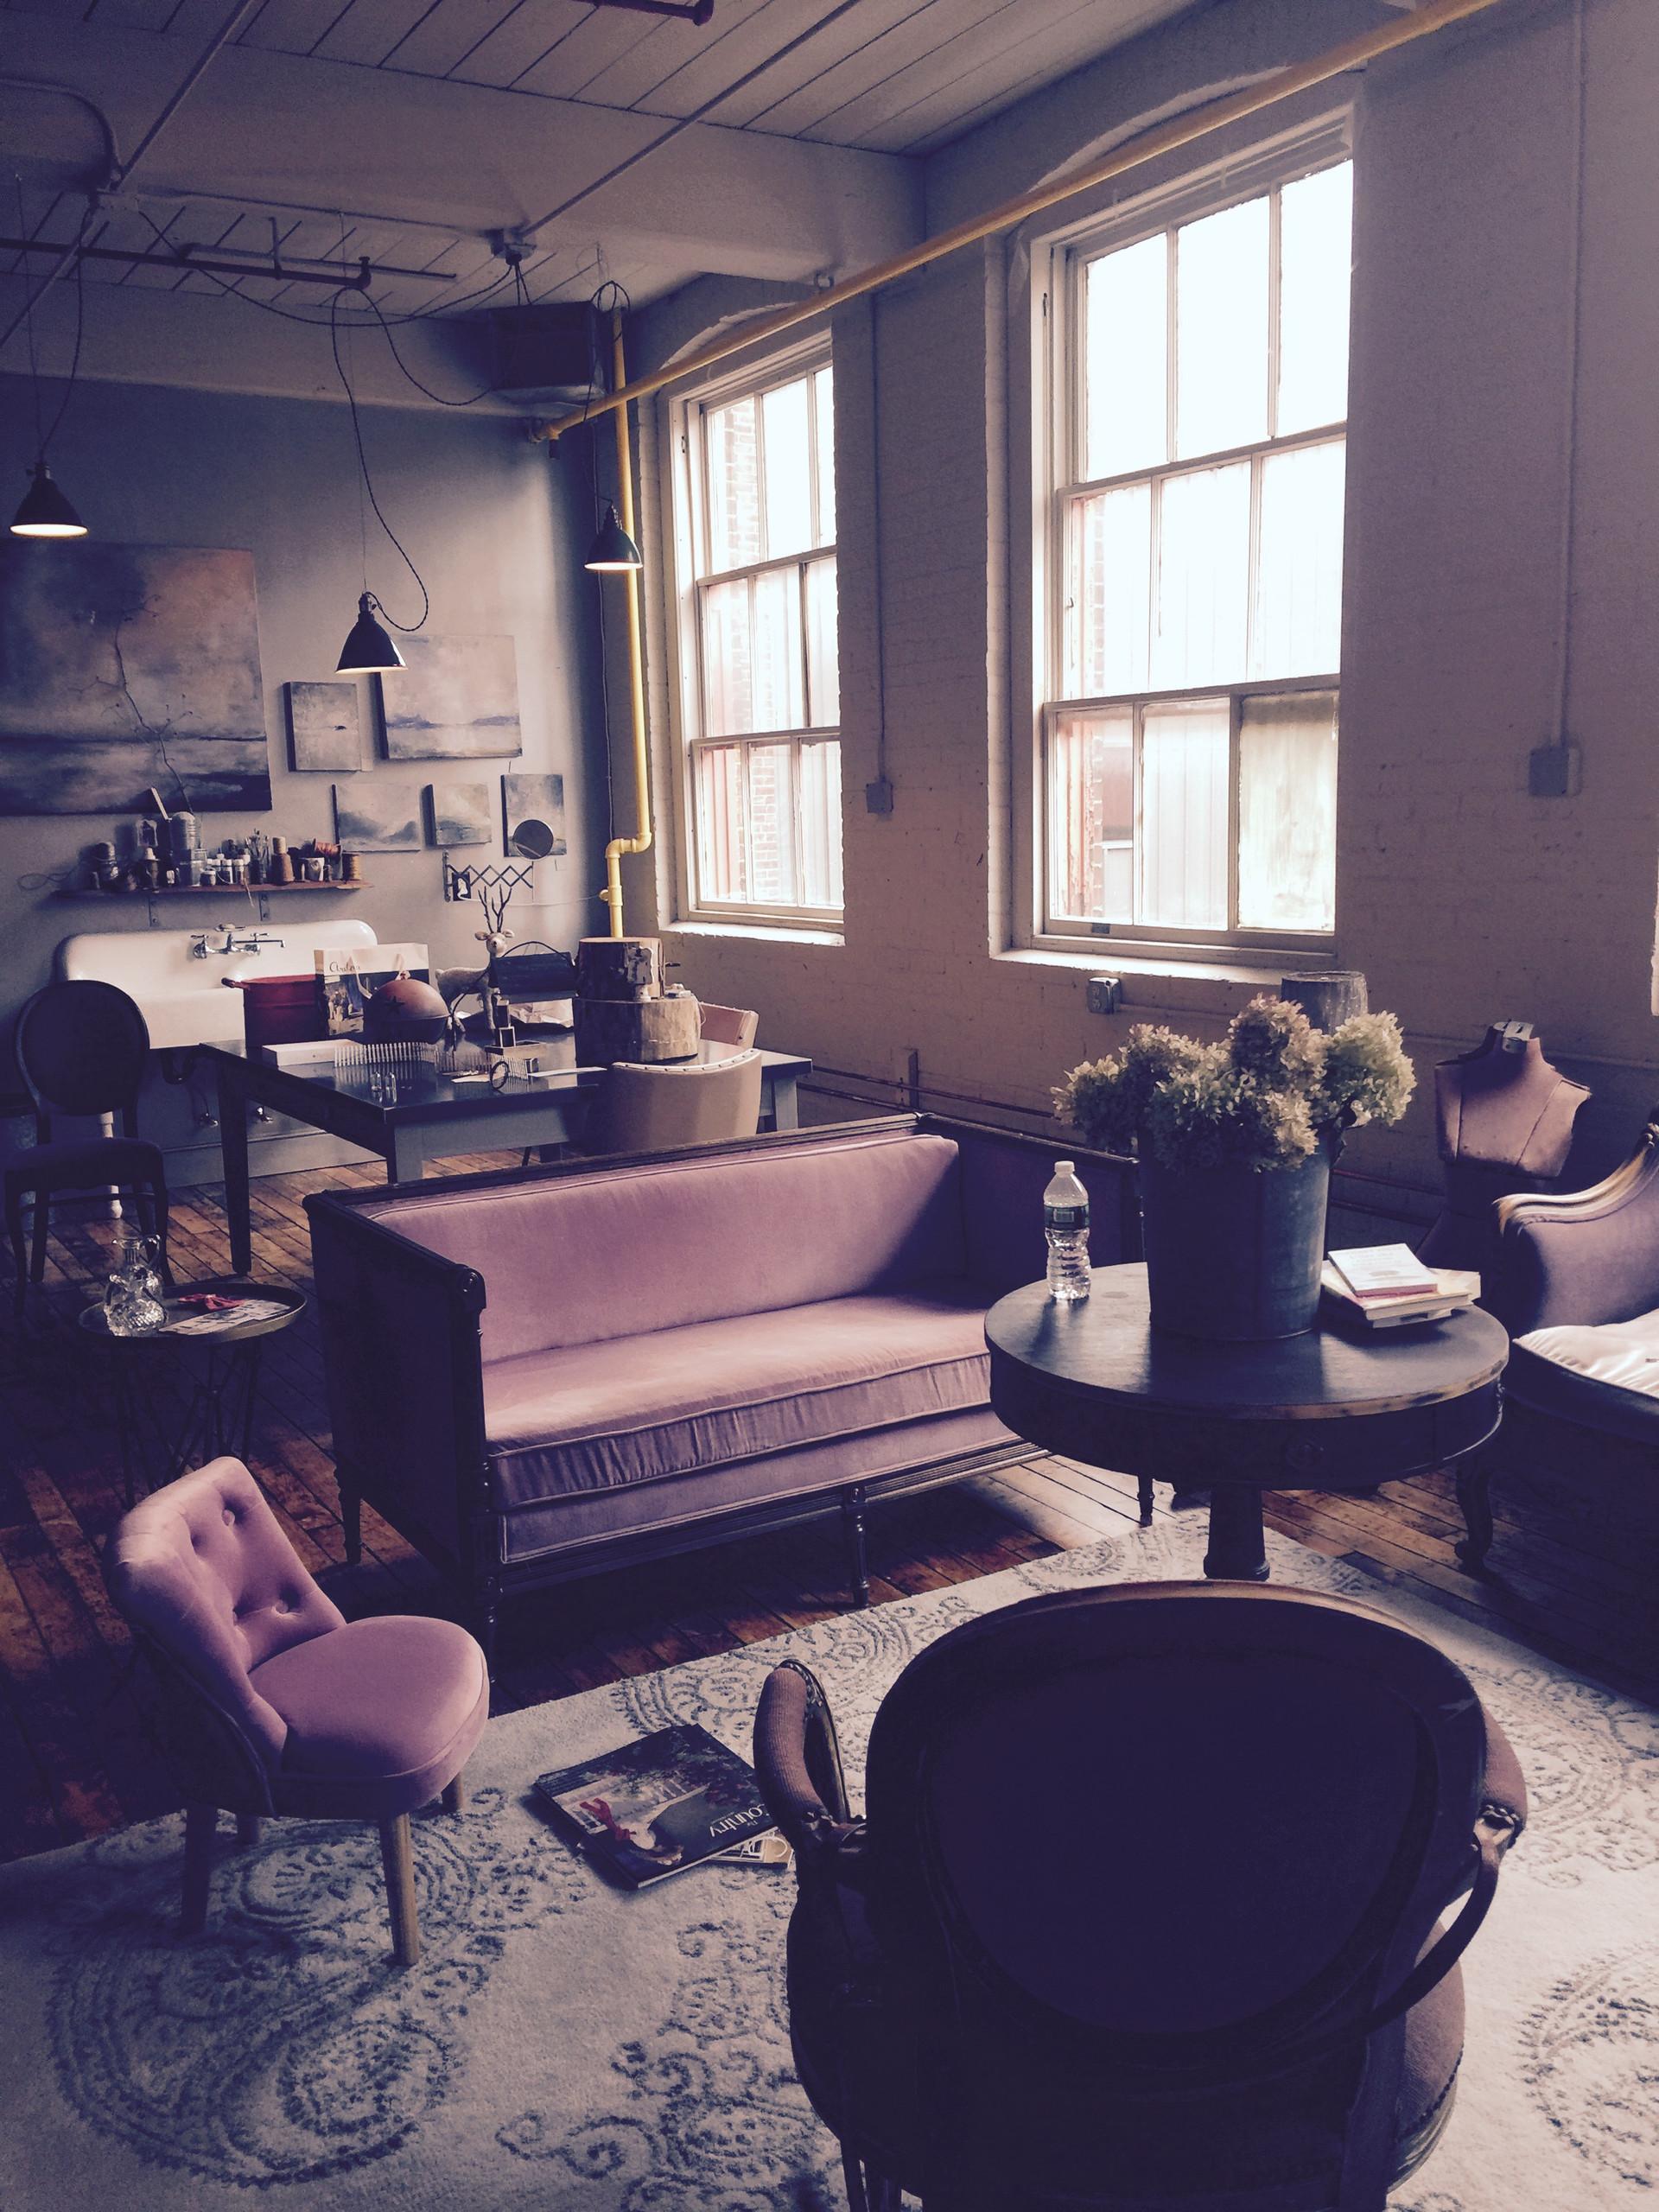 OP6 Lounge